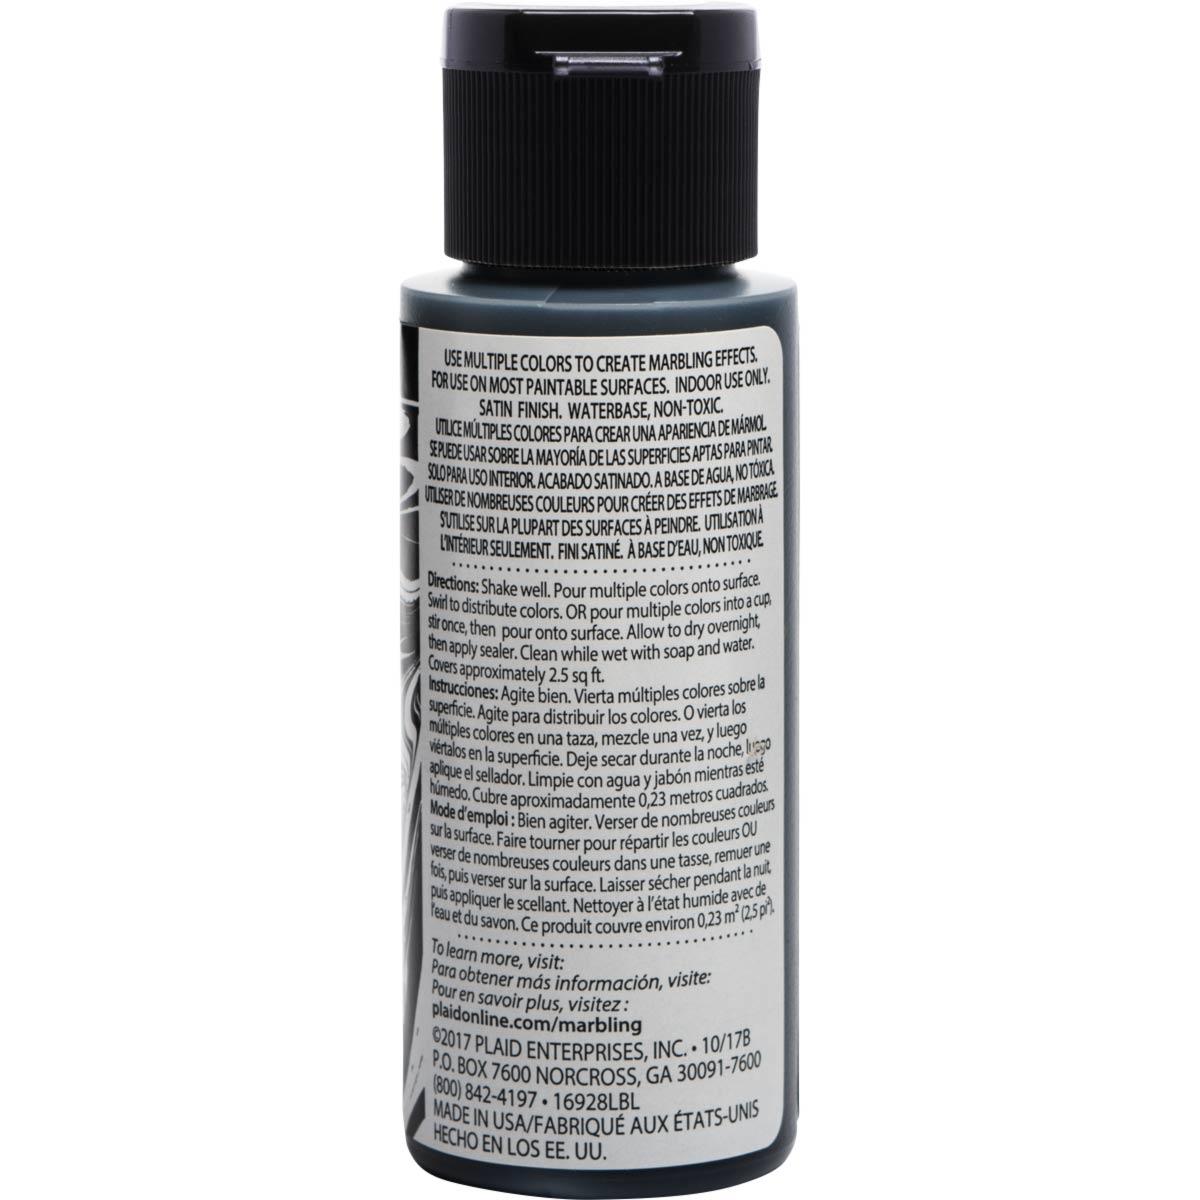 FolkArt ® Marbling Paint - Black, 2 oz. - 16928